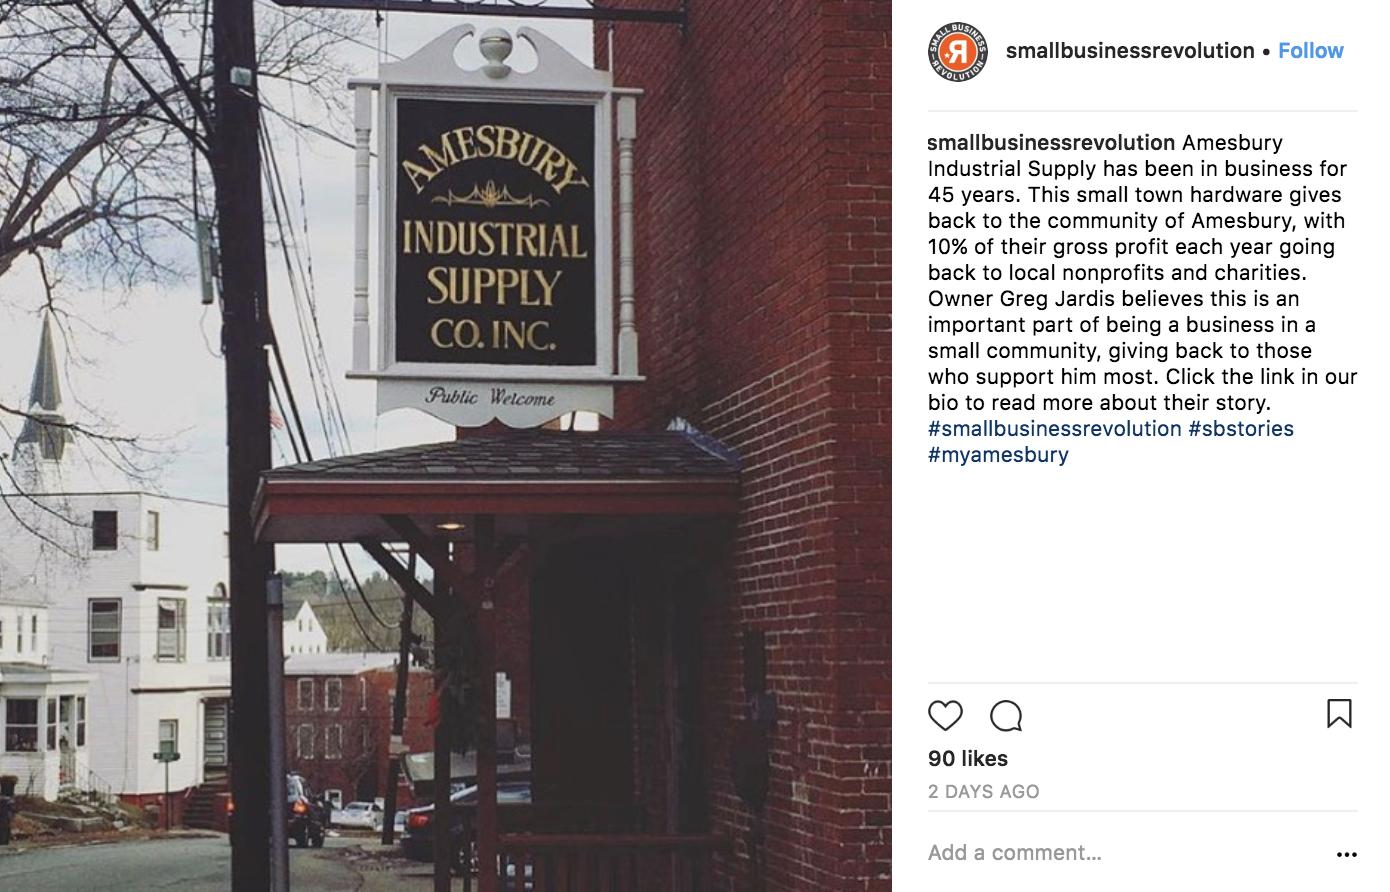 small-business-revolution-instagram-marketing-strategy